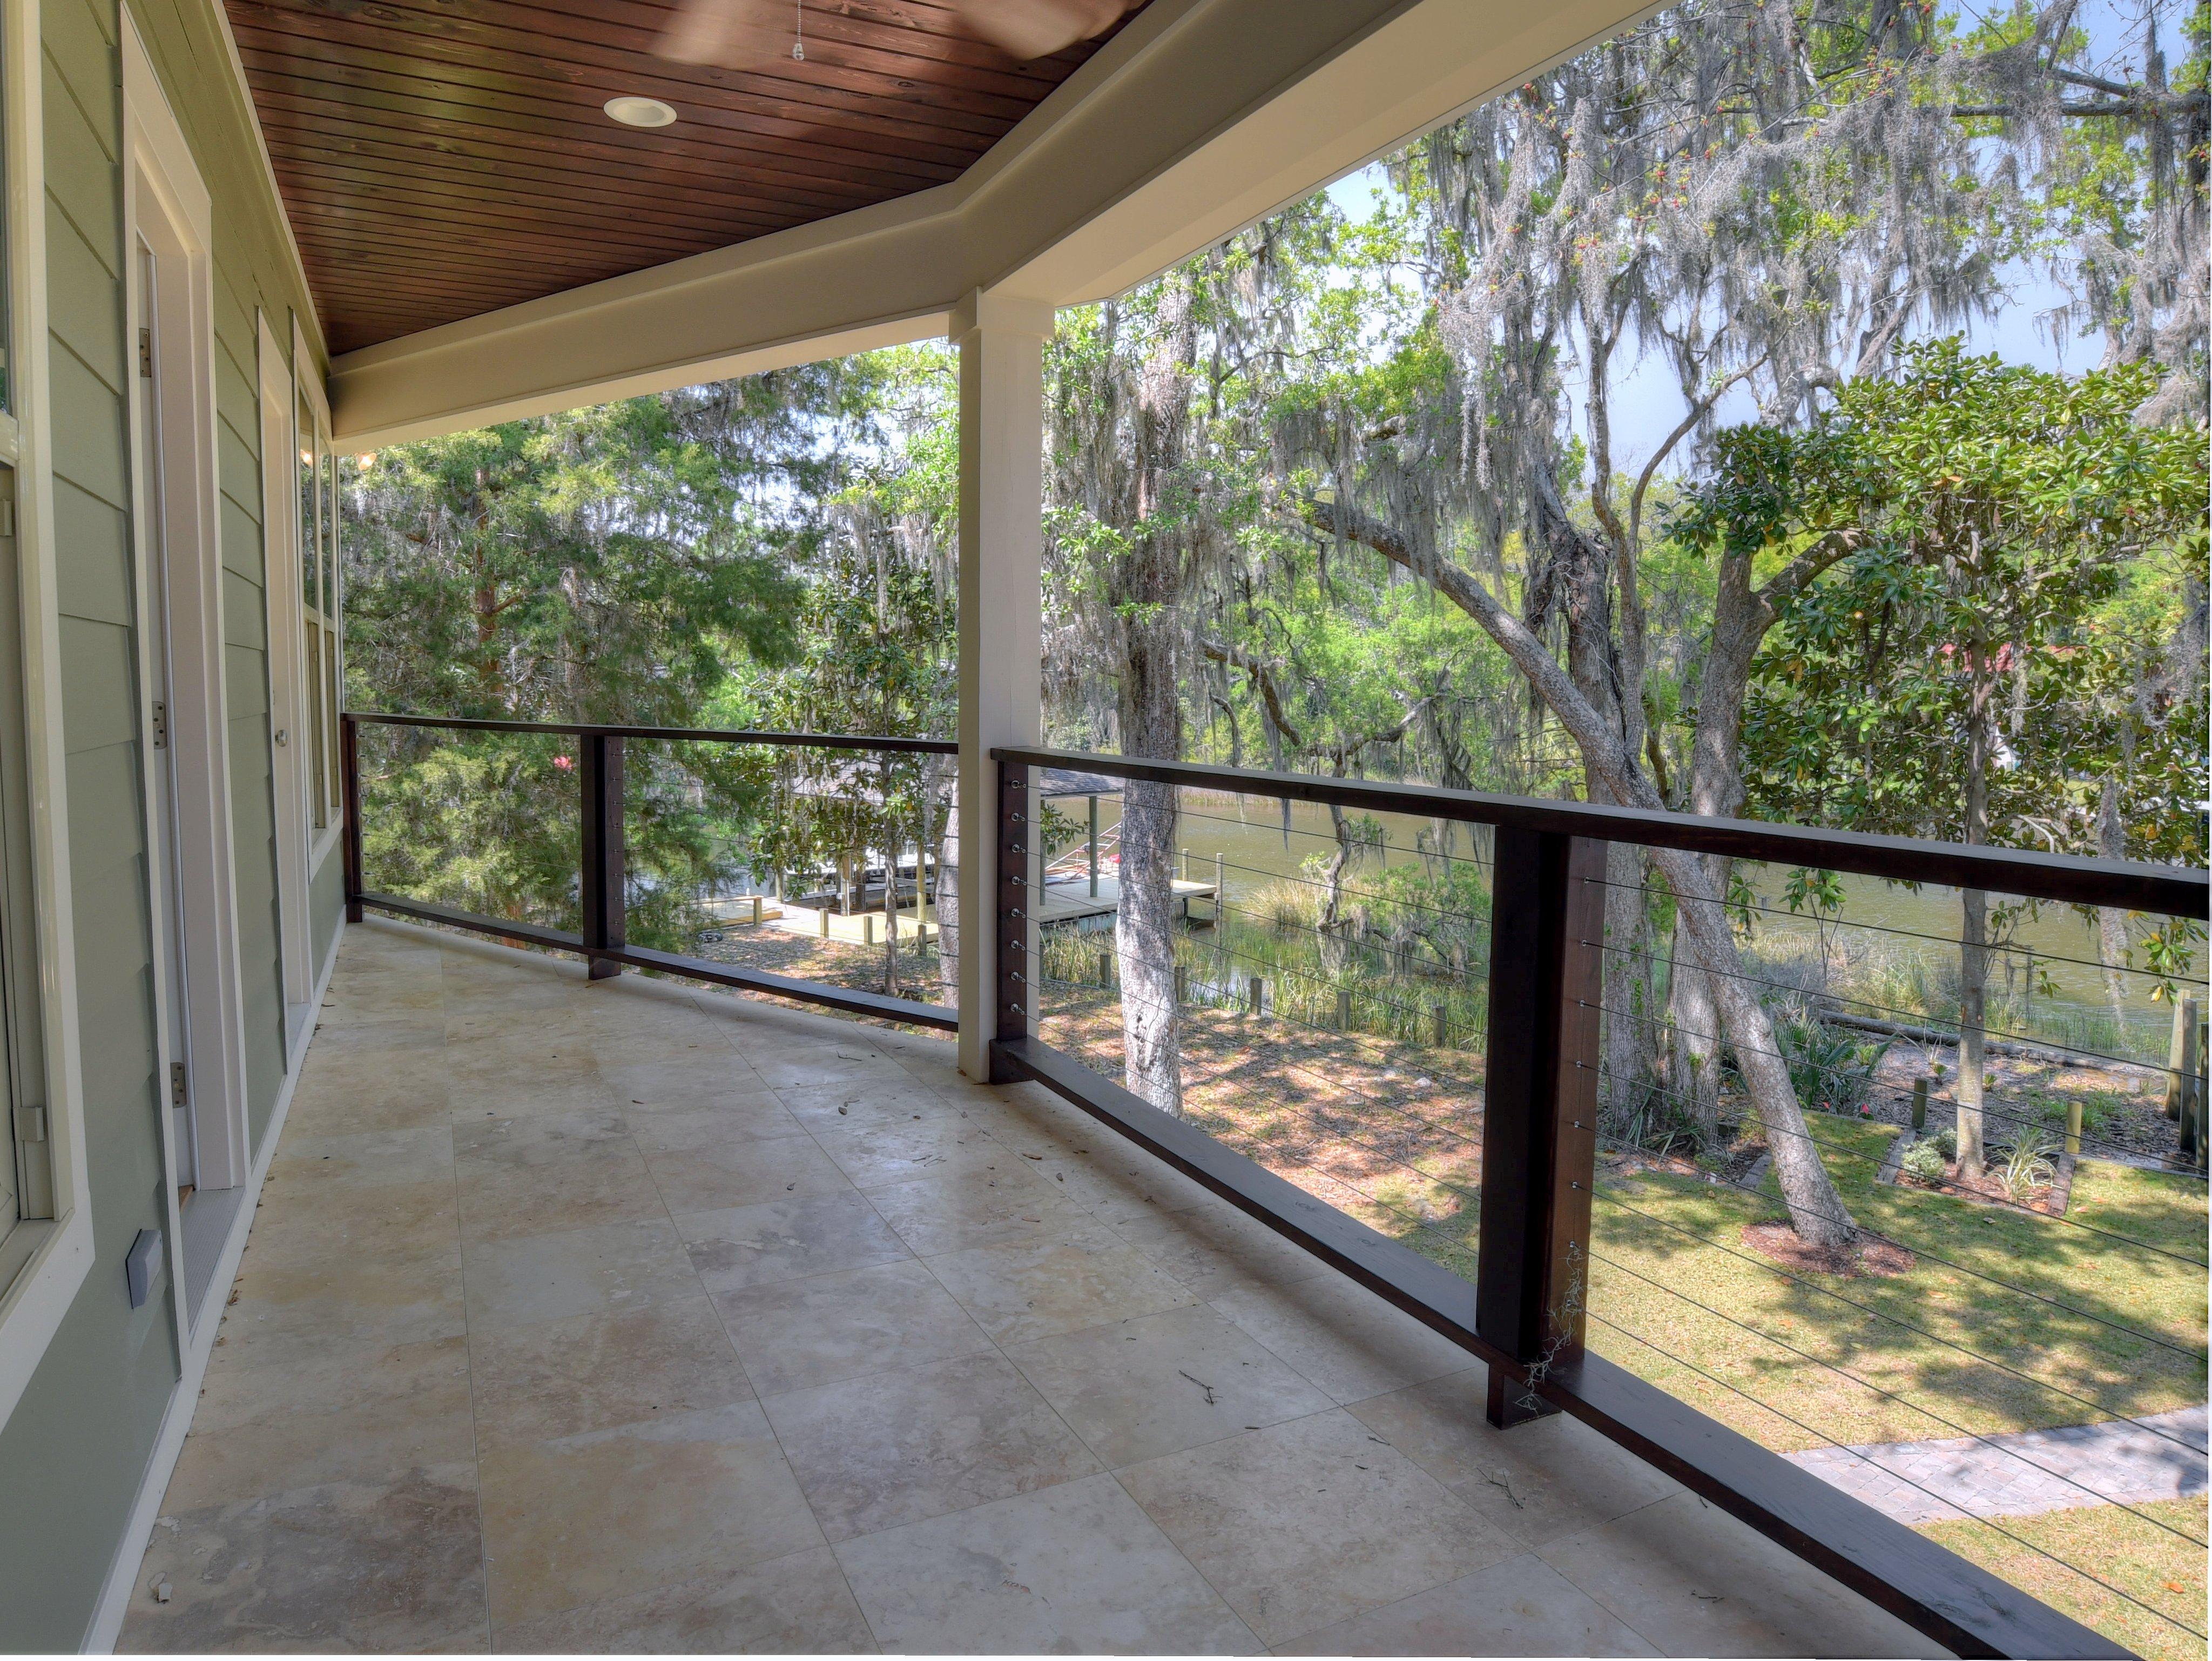 93 Beacon Point Condo rental in Sandestin Rentals ~ Cottages and Villas  in Destin Florida - #29